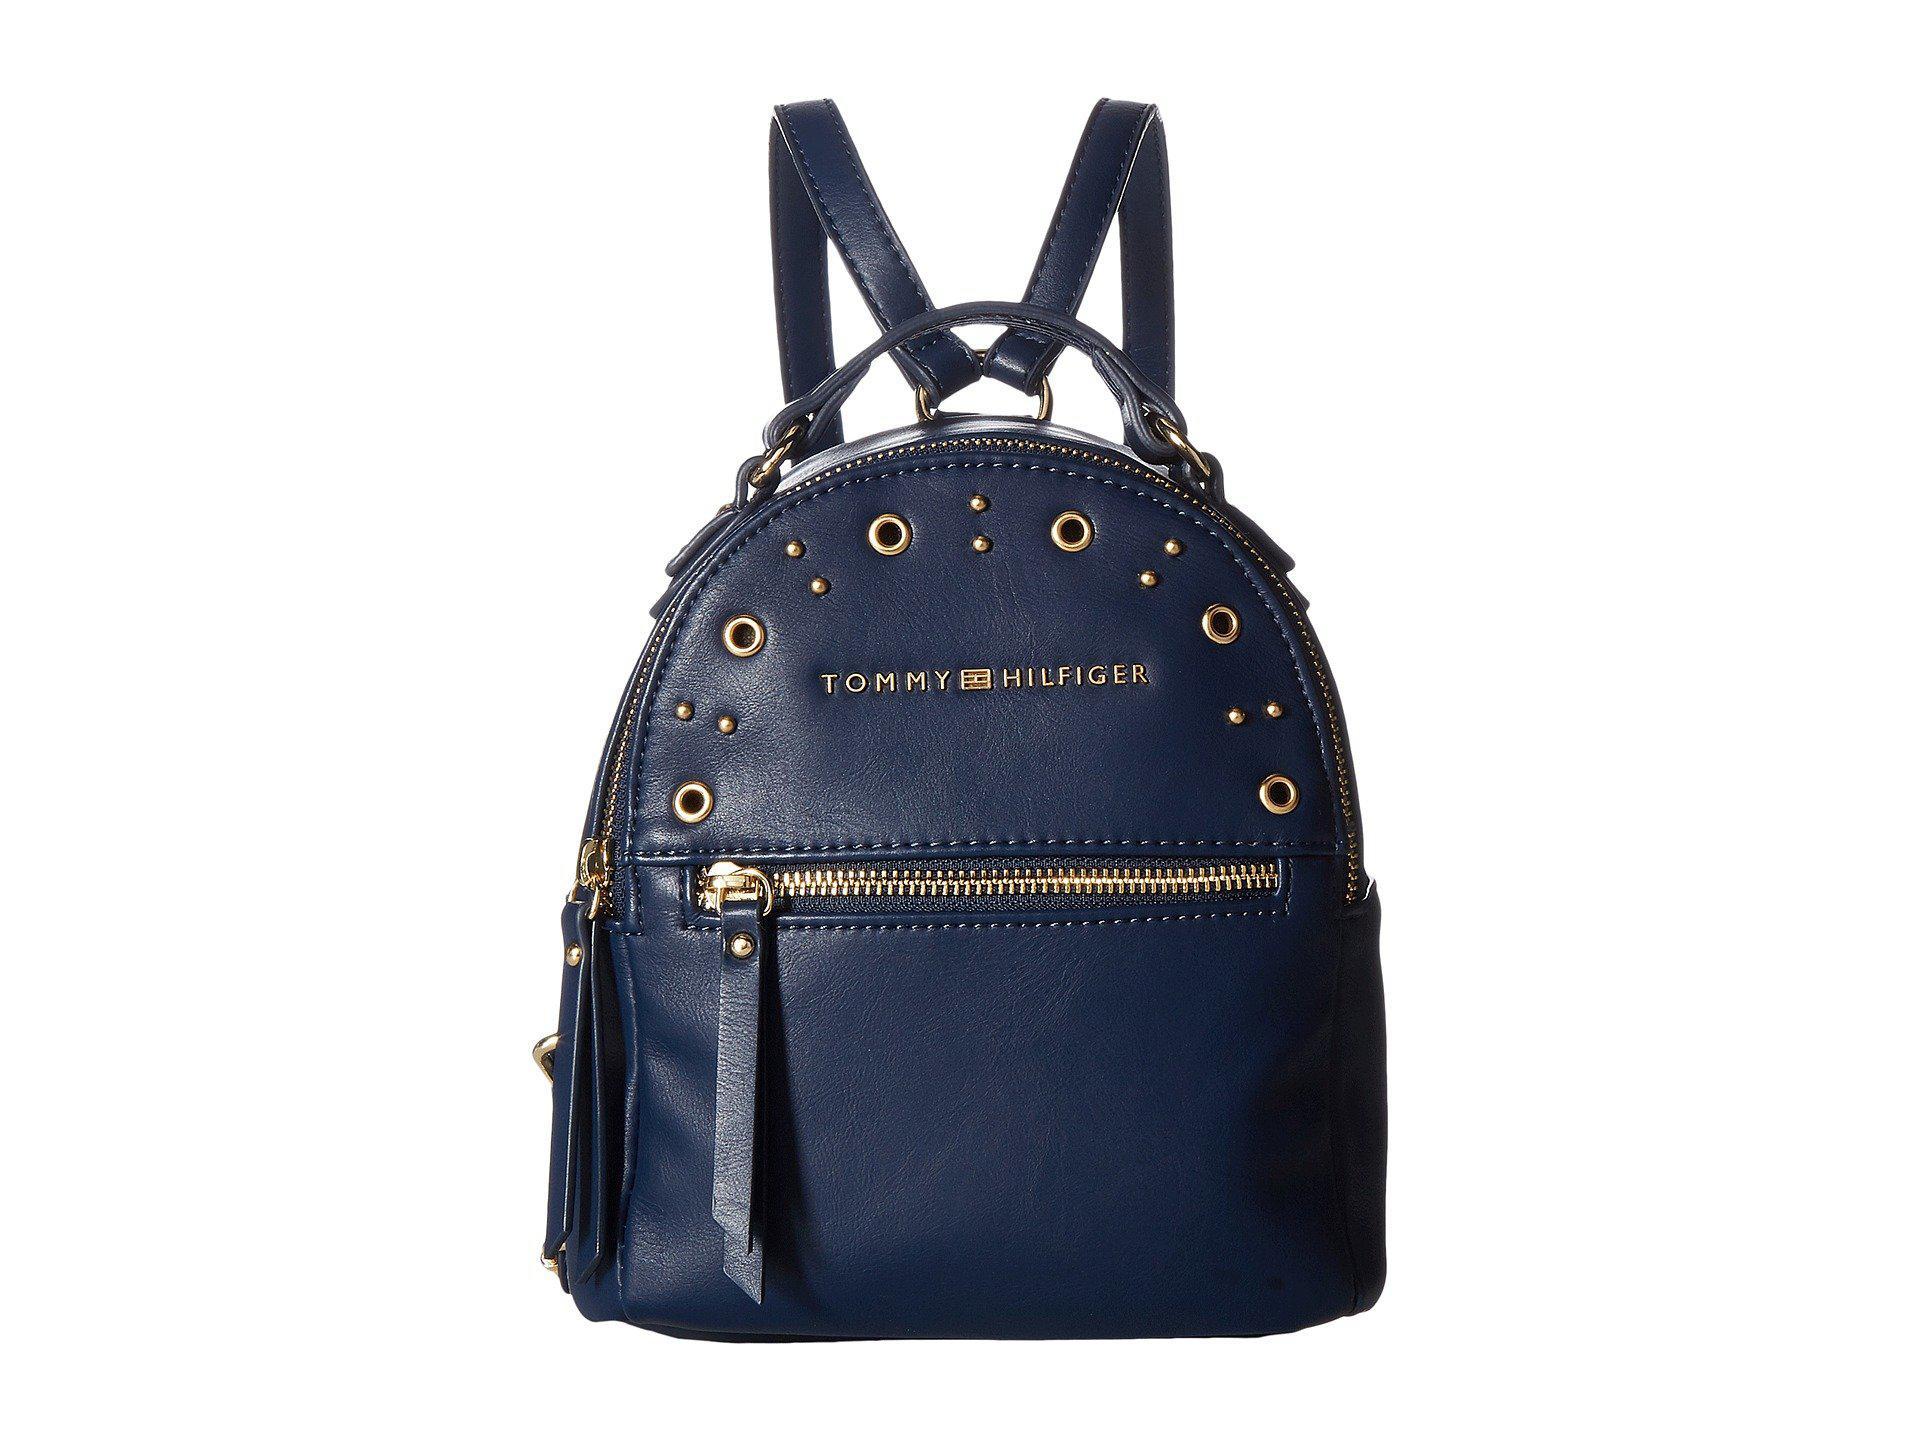 b7f6e11911e Tommy Hilfiger Aileen Mini Backpack in Blue - Lyst